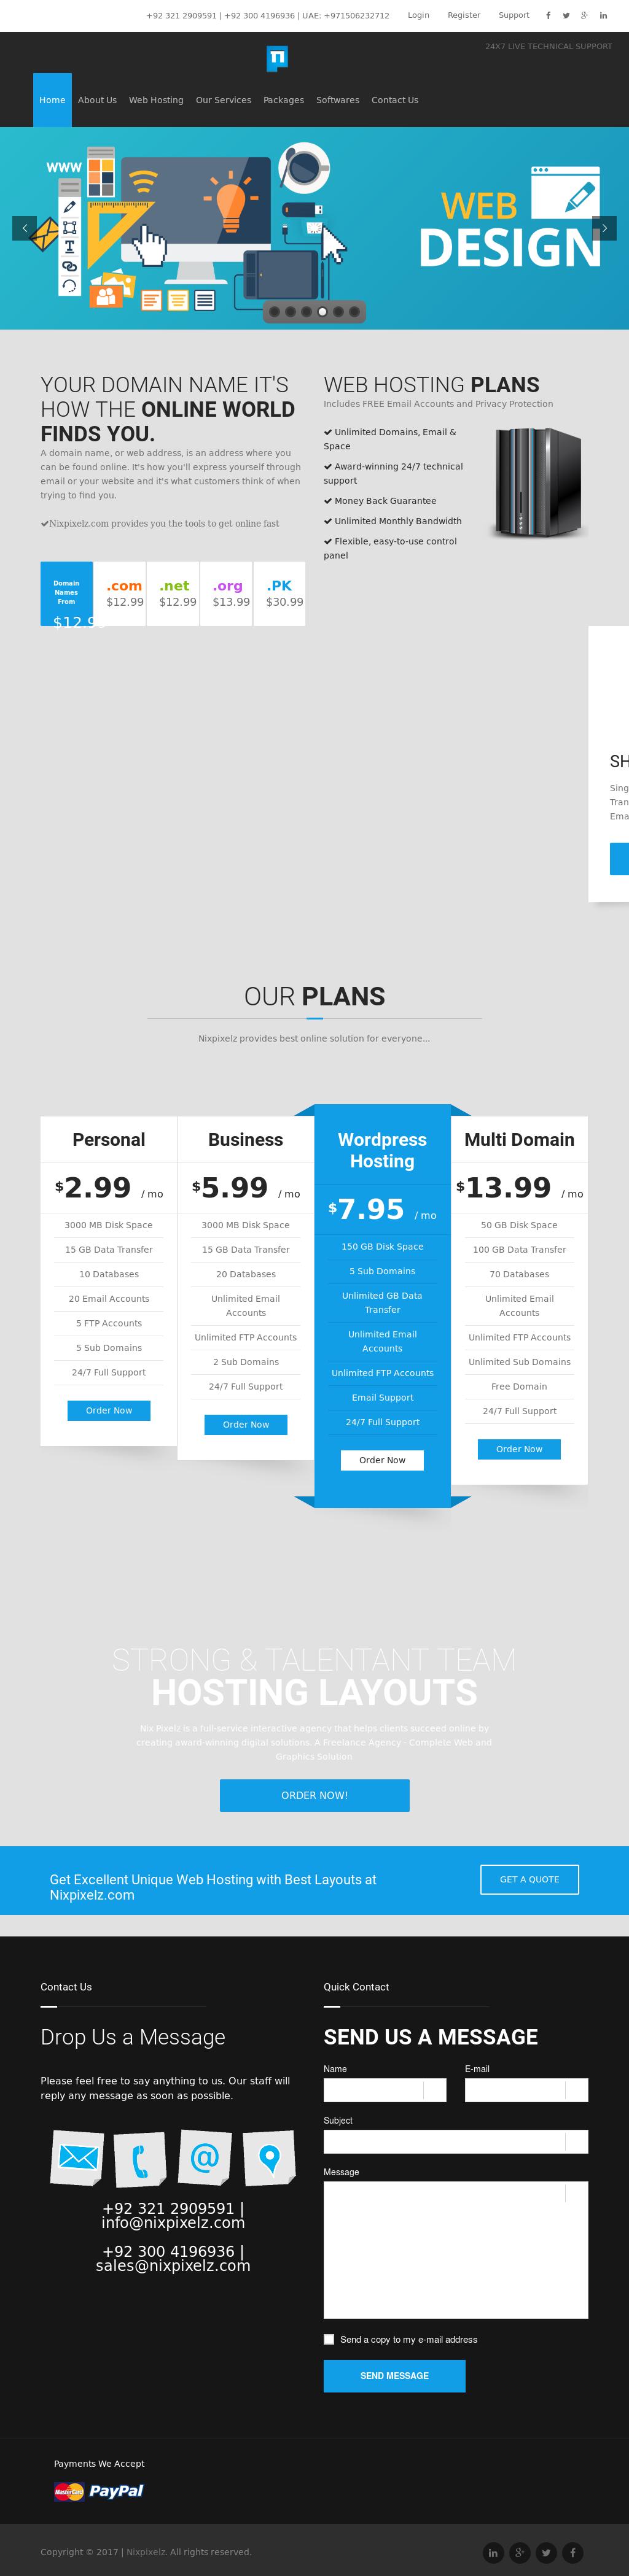 Nix Pixelz Competitors, Revenue and Employees - Owler Company Profile